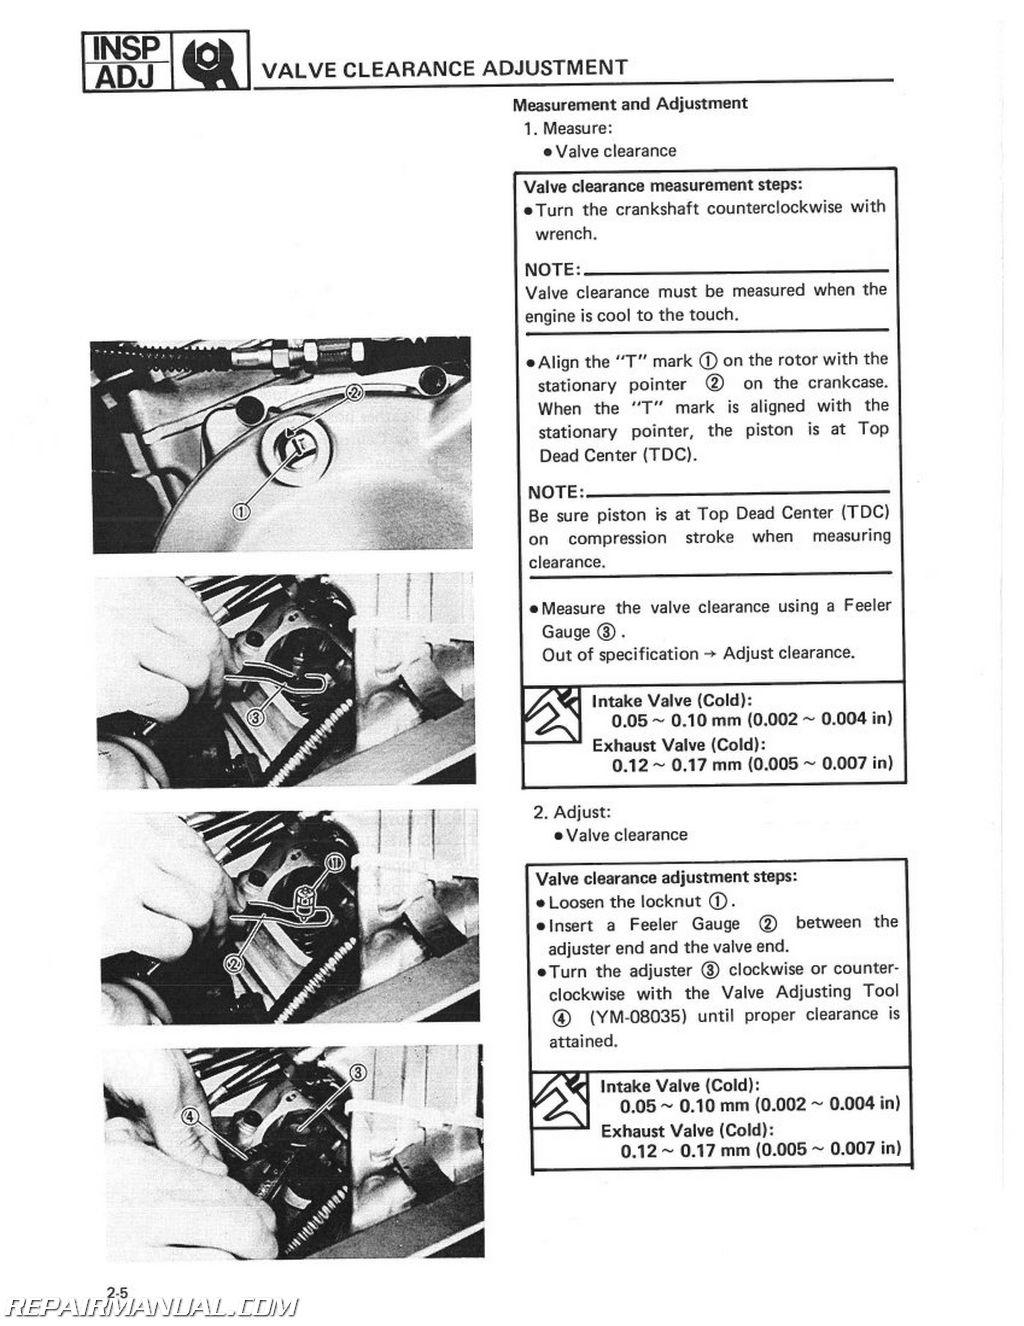 yamaha vstar 1100 xvs1100l lc full service repair manual 2000 2004